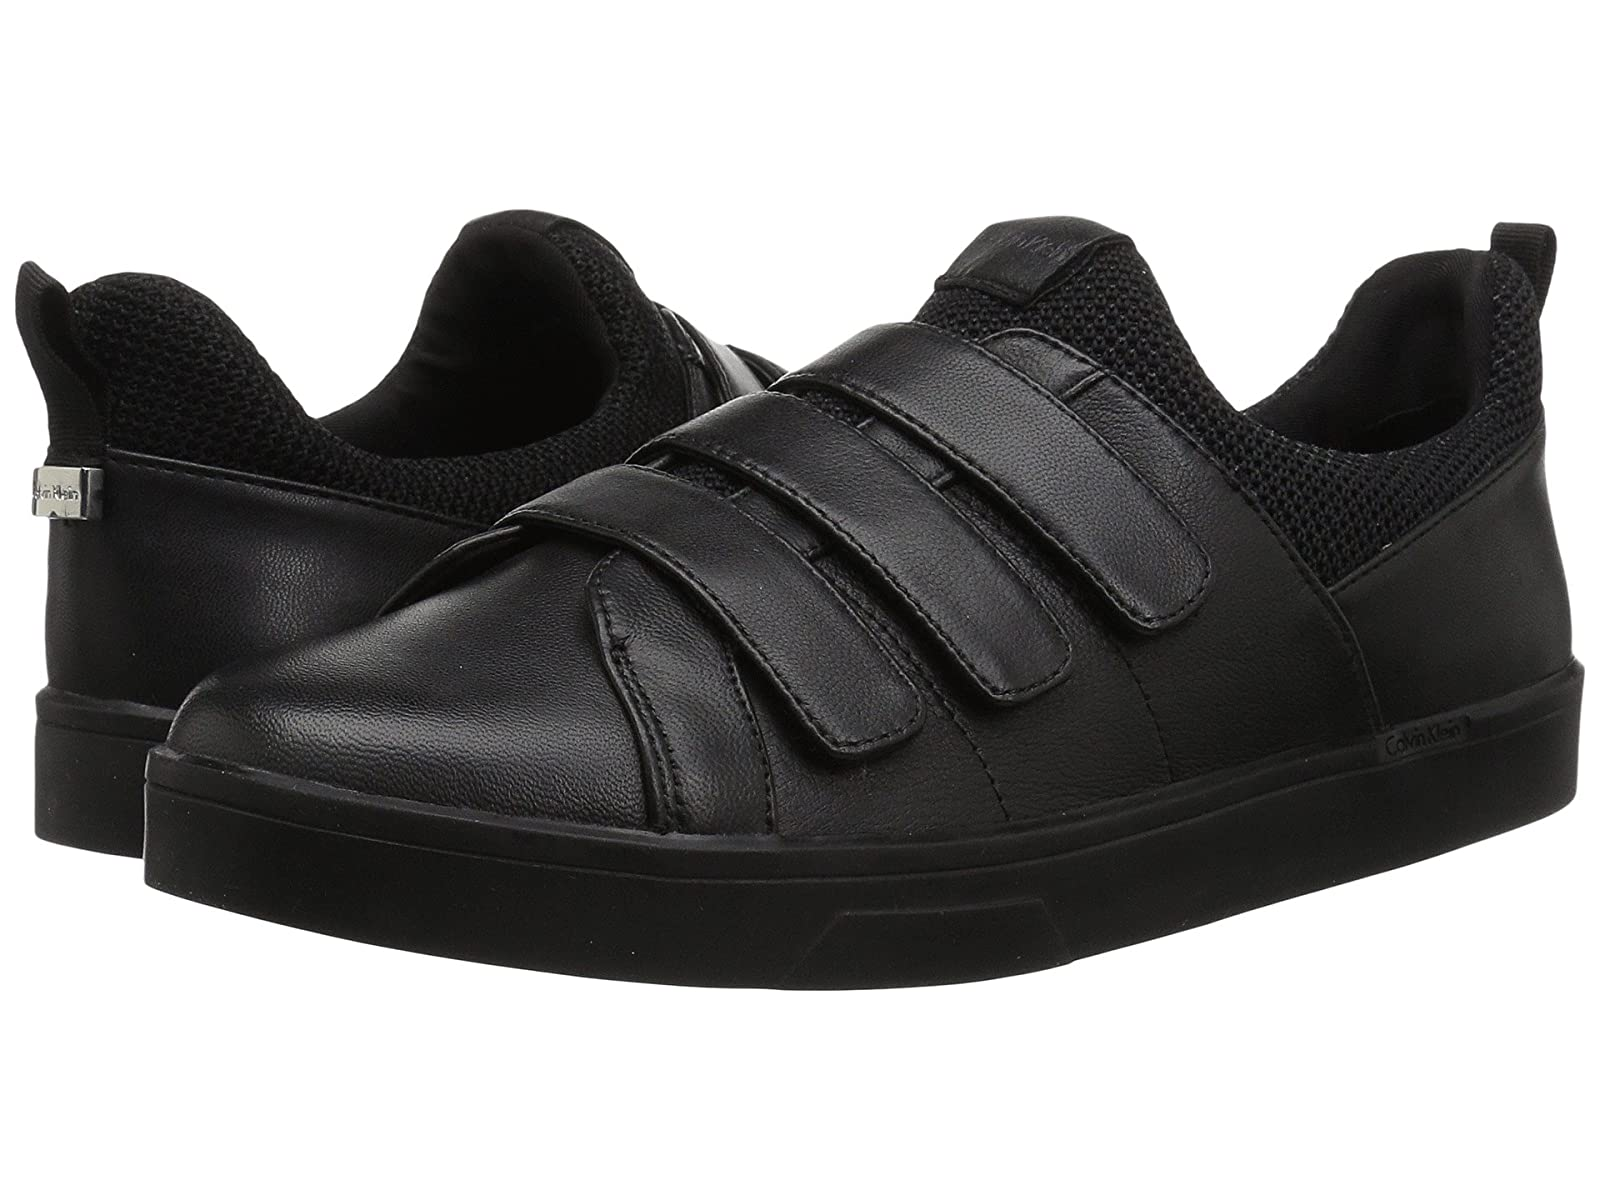 Calvin Klein IrahCheap and distinctive eye-catching shoes